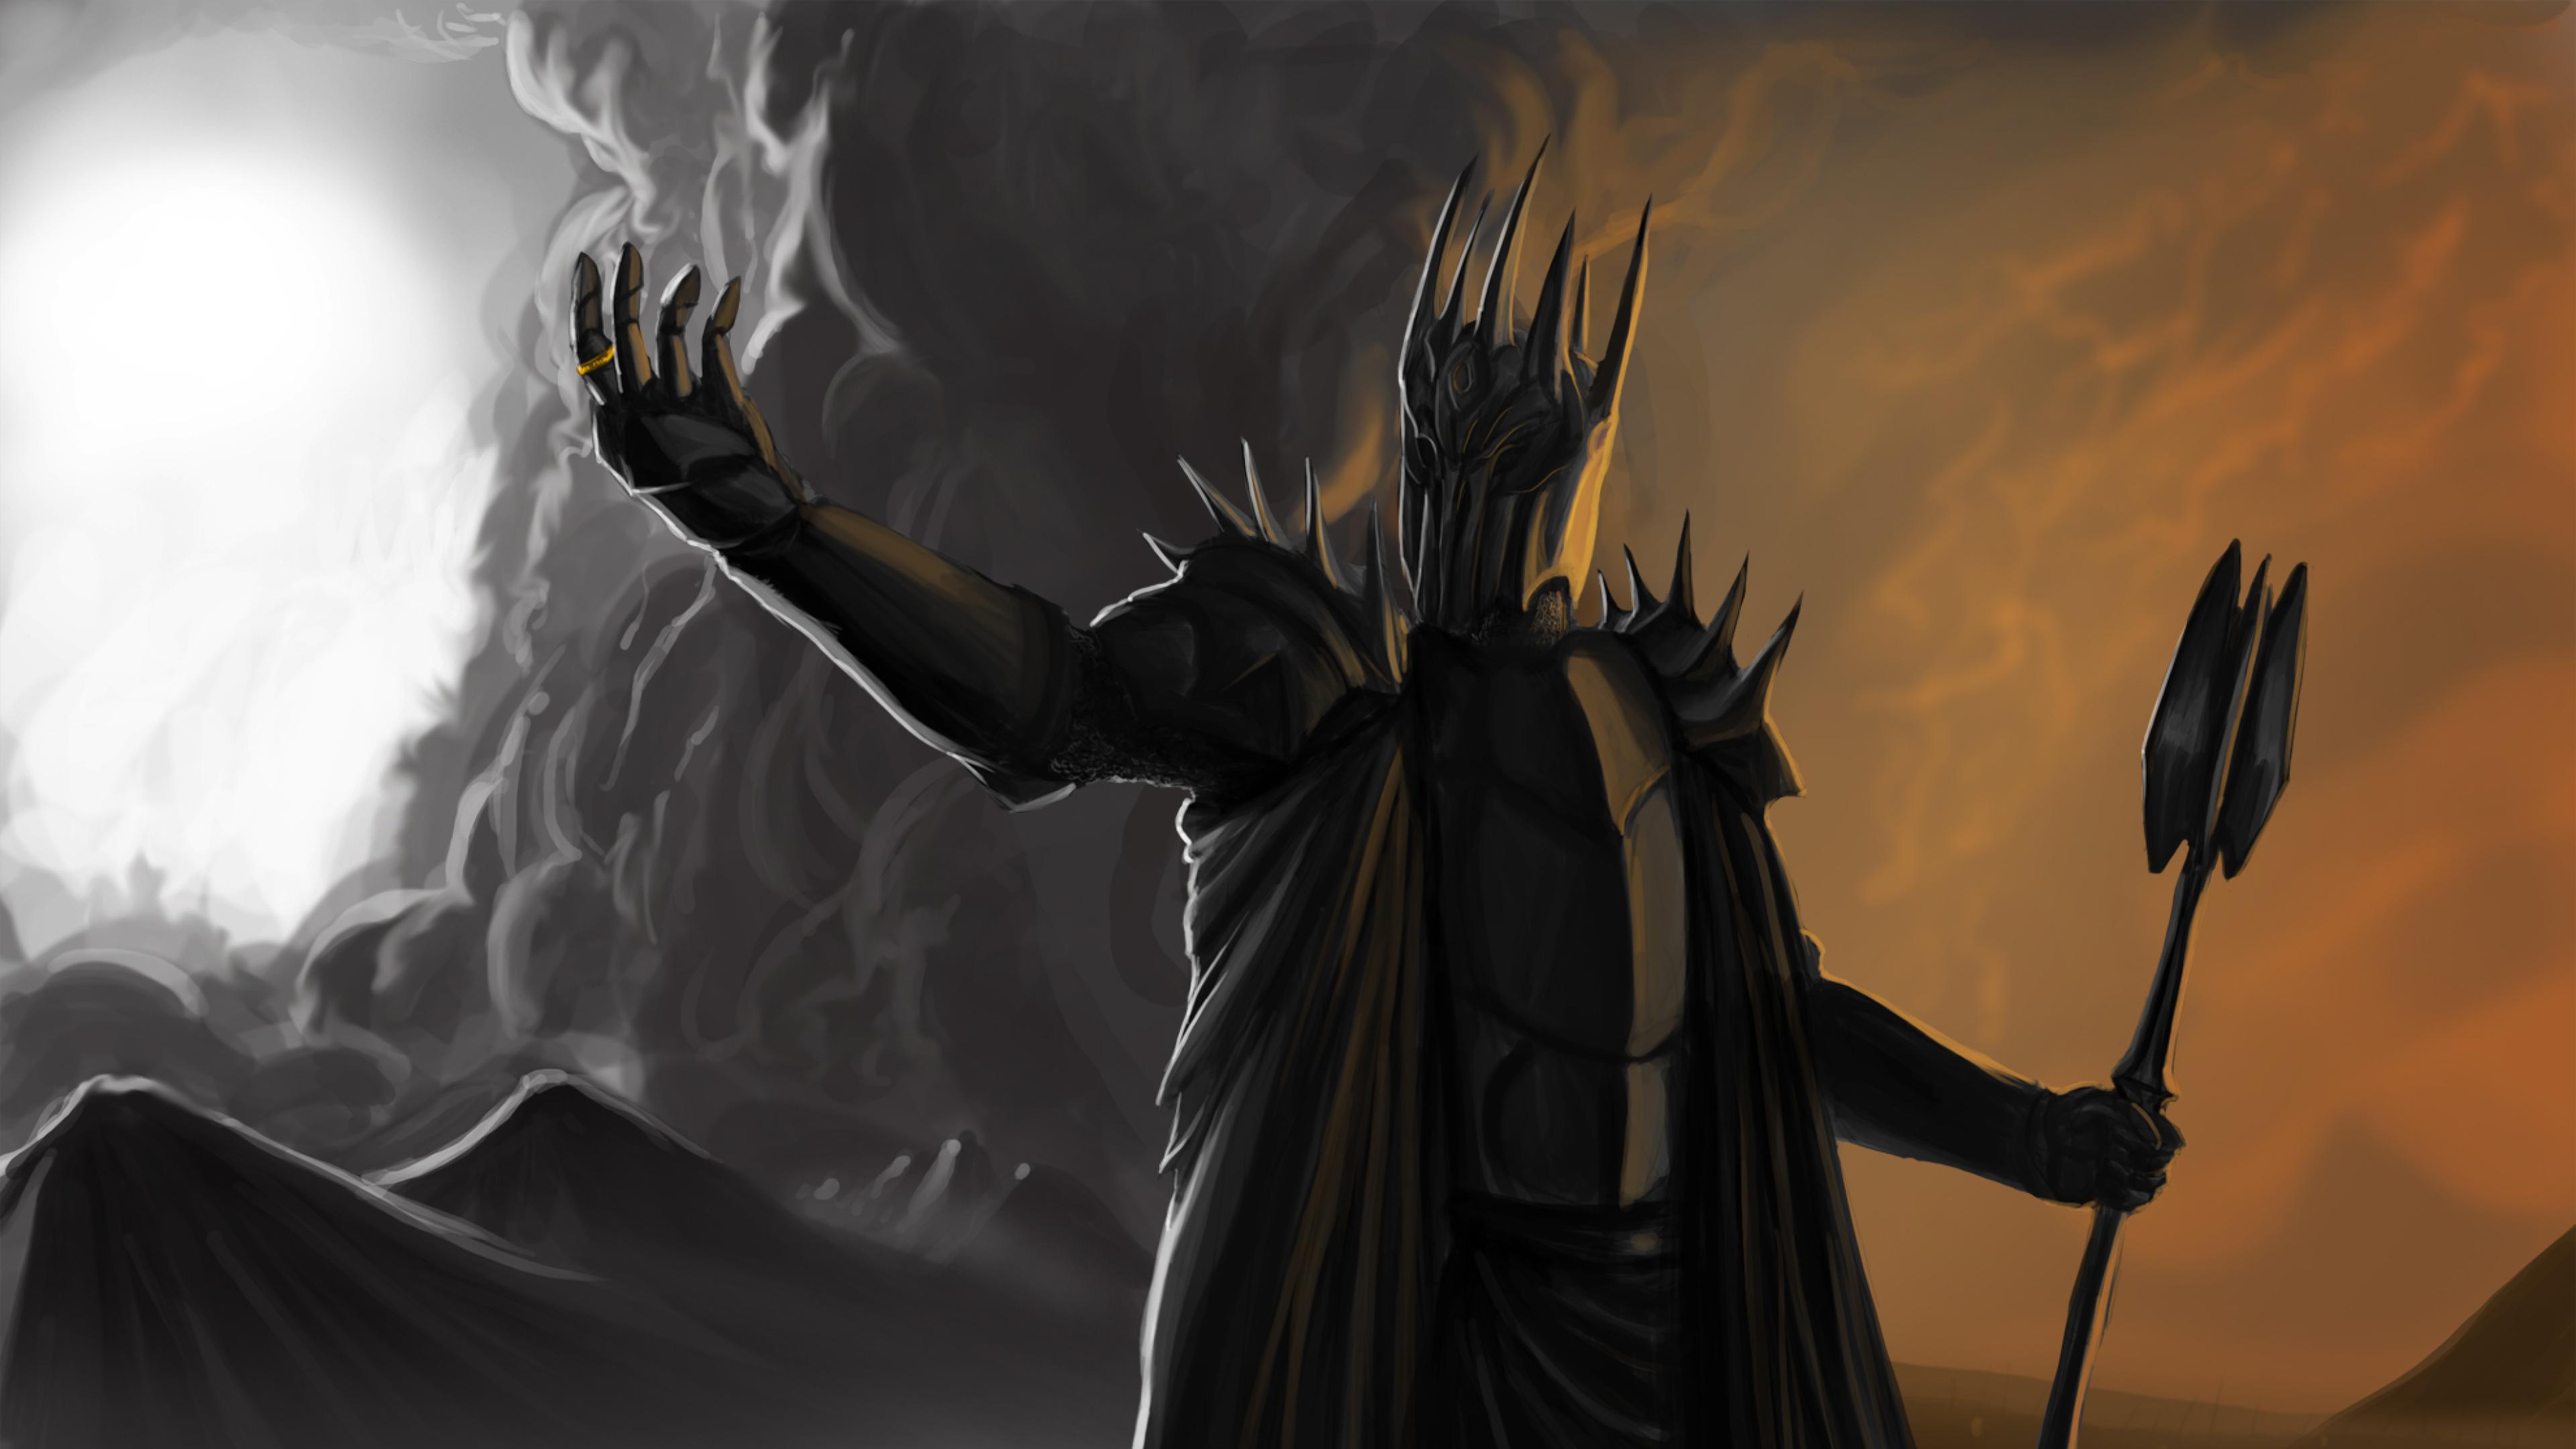 3840x2160 Sauron Lord Of The Rings 4k Wallpaper Hd Fantasy 4k